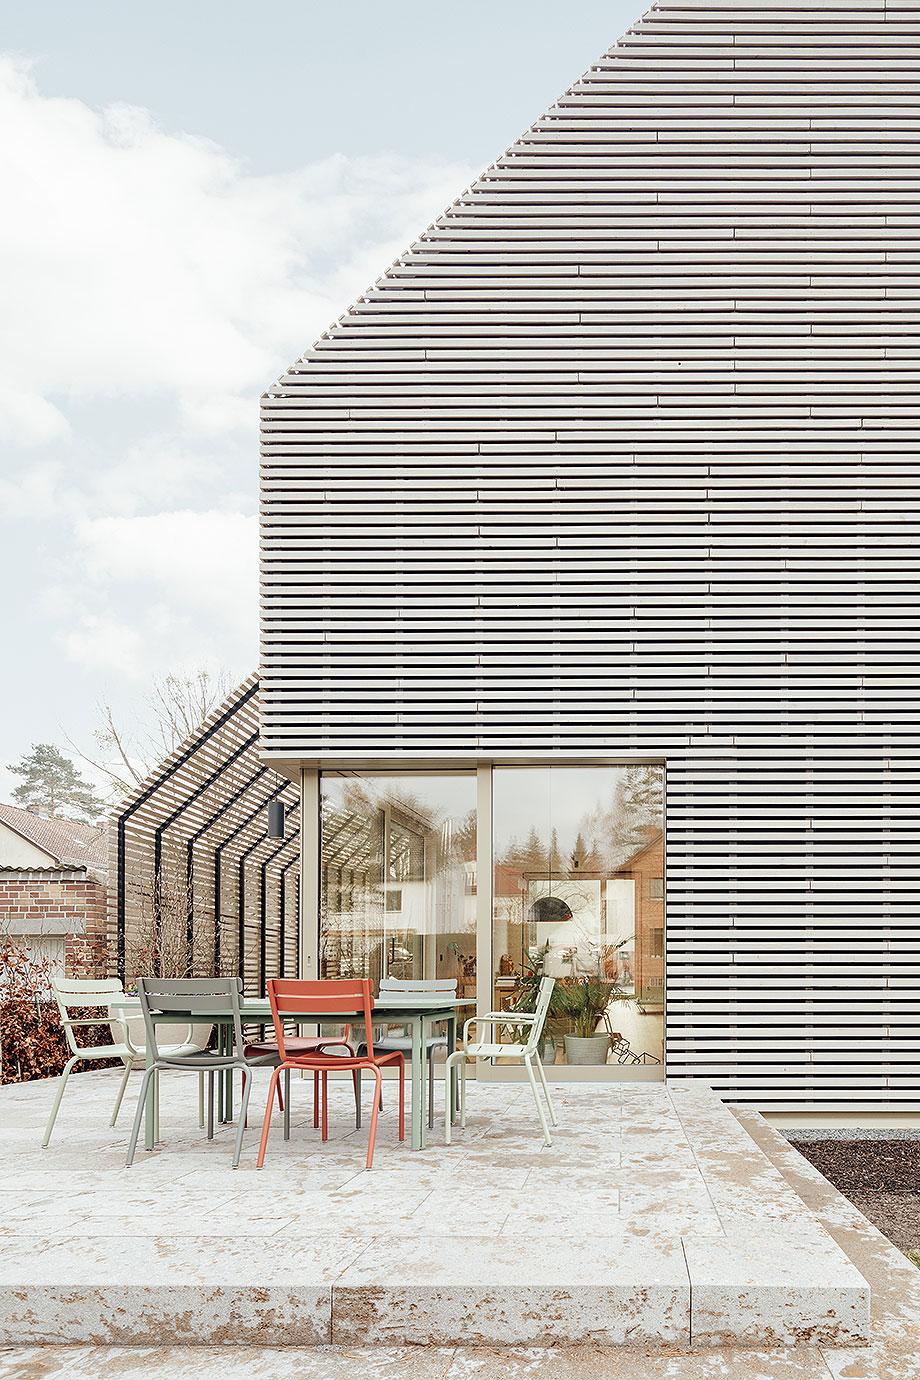 la casa de la pergola de rundzwei architekten (2) - foto gui rebelo